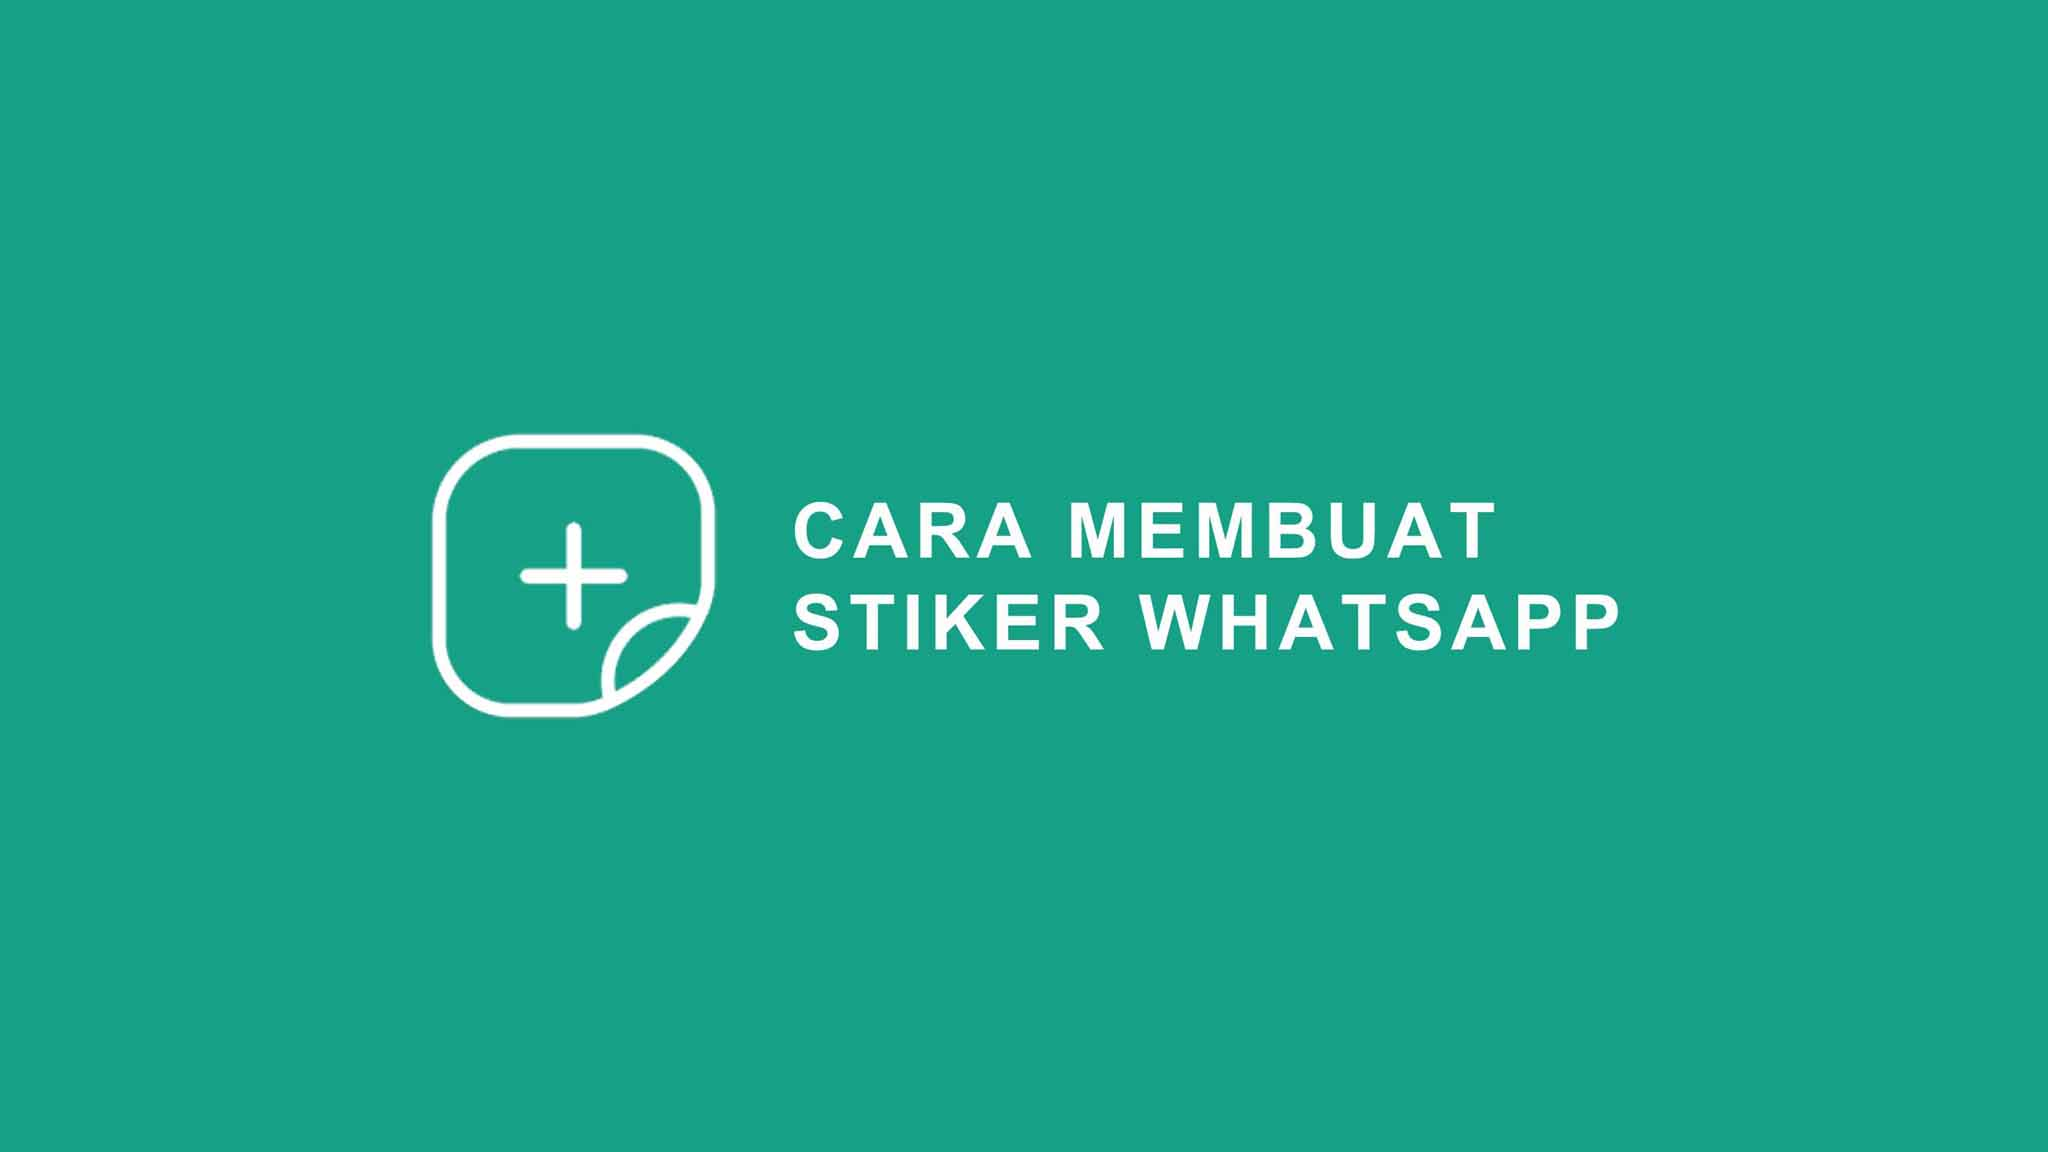 4 Cara Membuat Stiker Di Wa Whatsapp Dengan Foto Sendiri Mudah